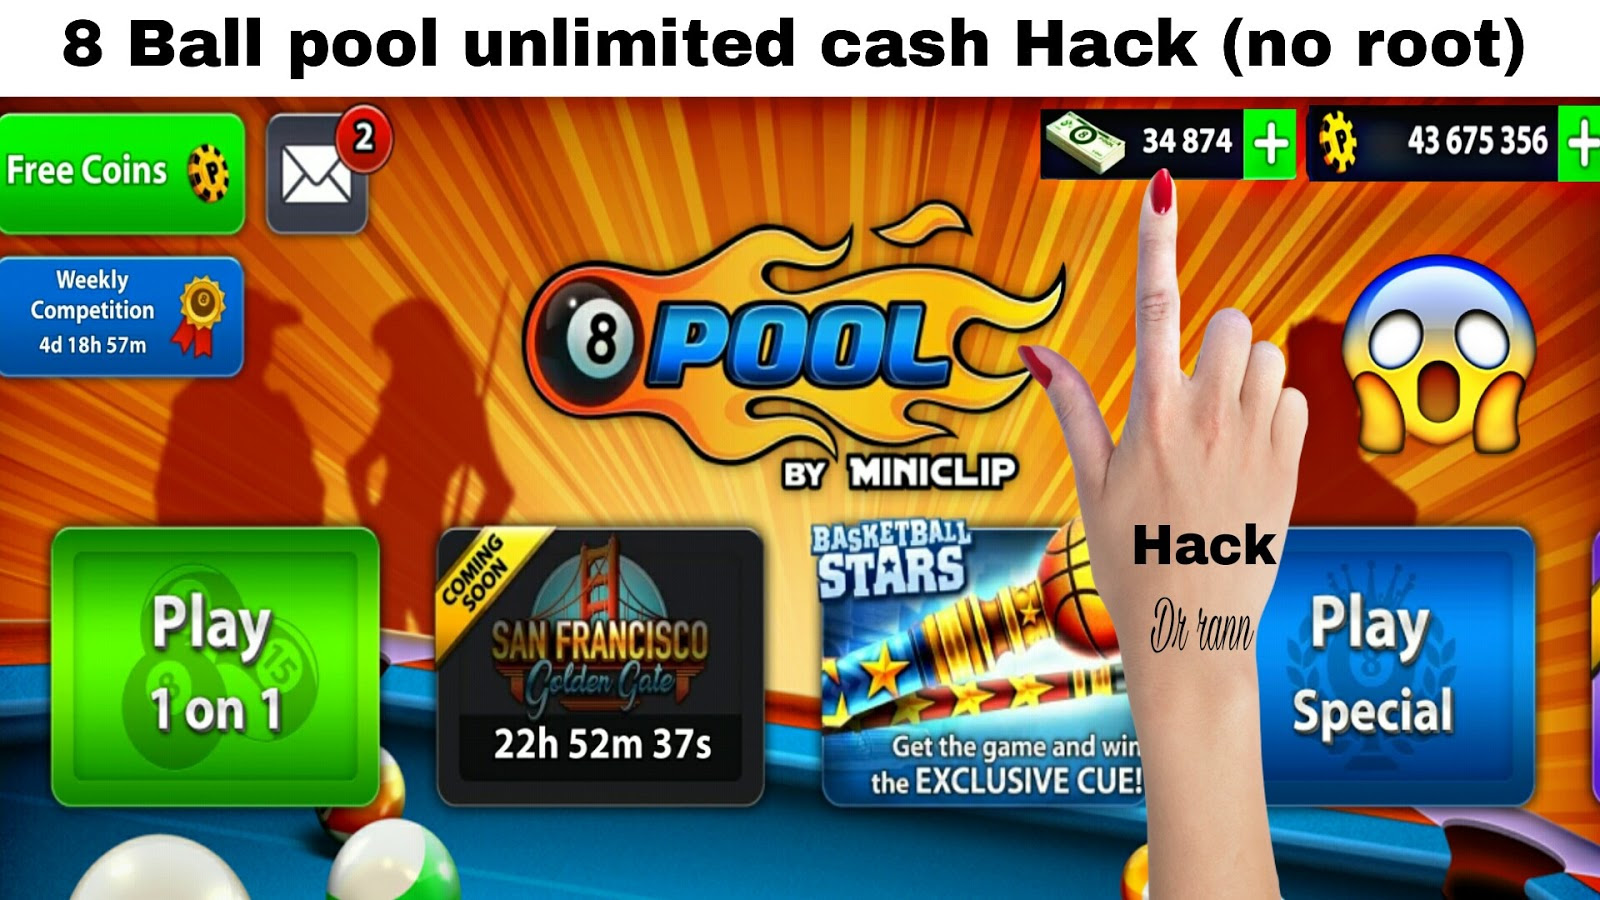 8Ballp.Co 8 Ball Pool Hack Cheats - Grab Coins And Cash ... -